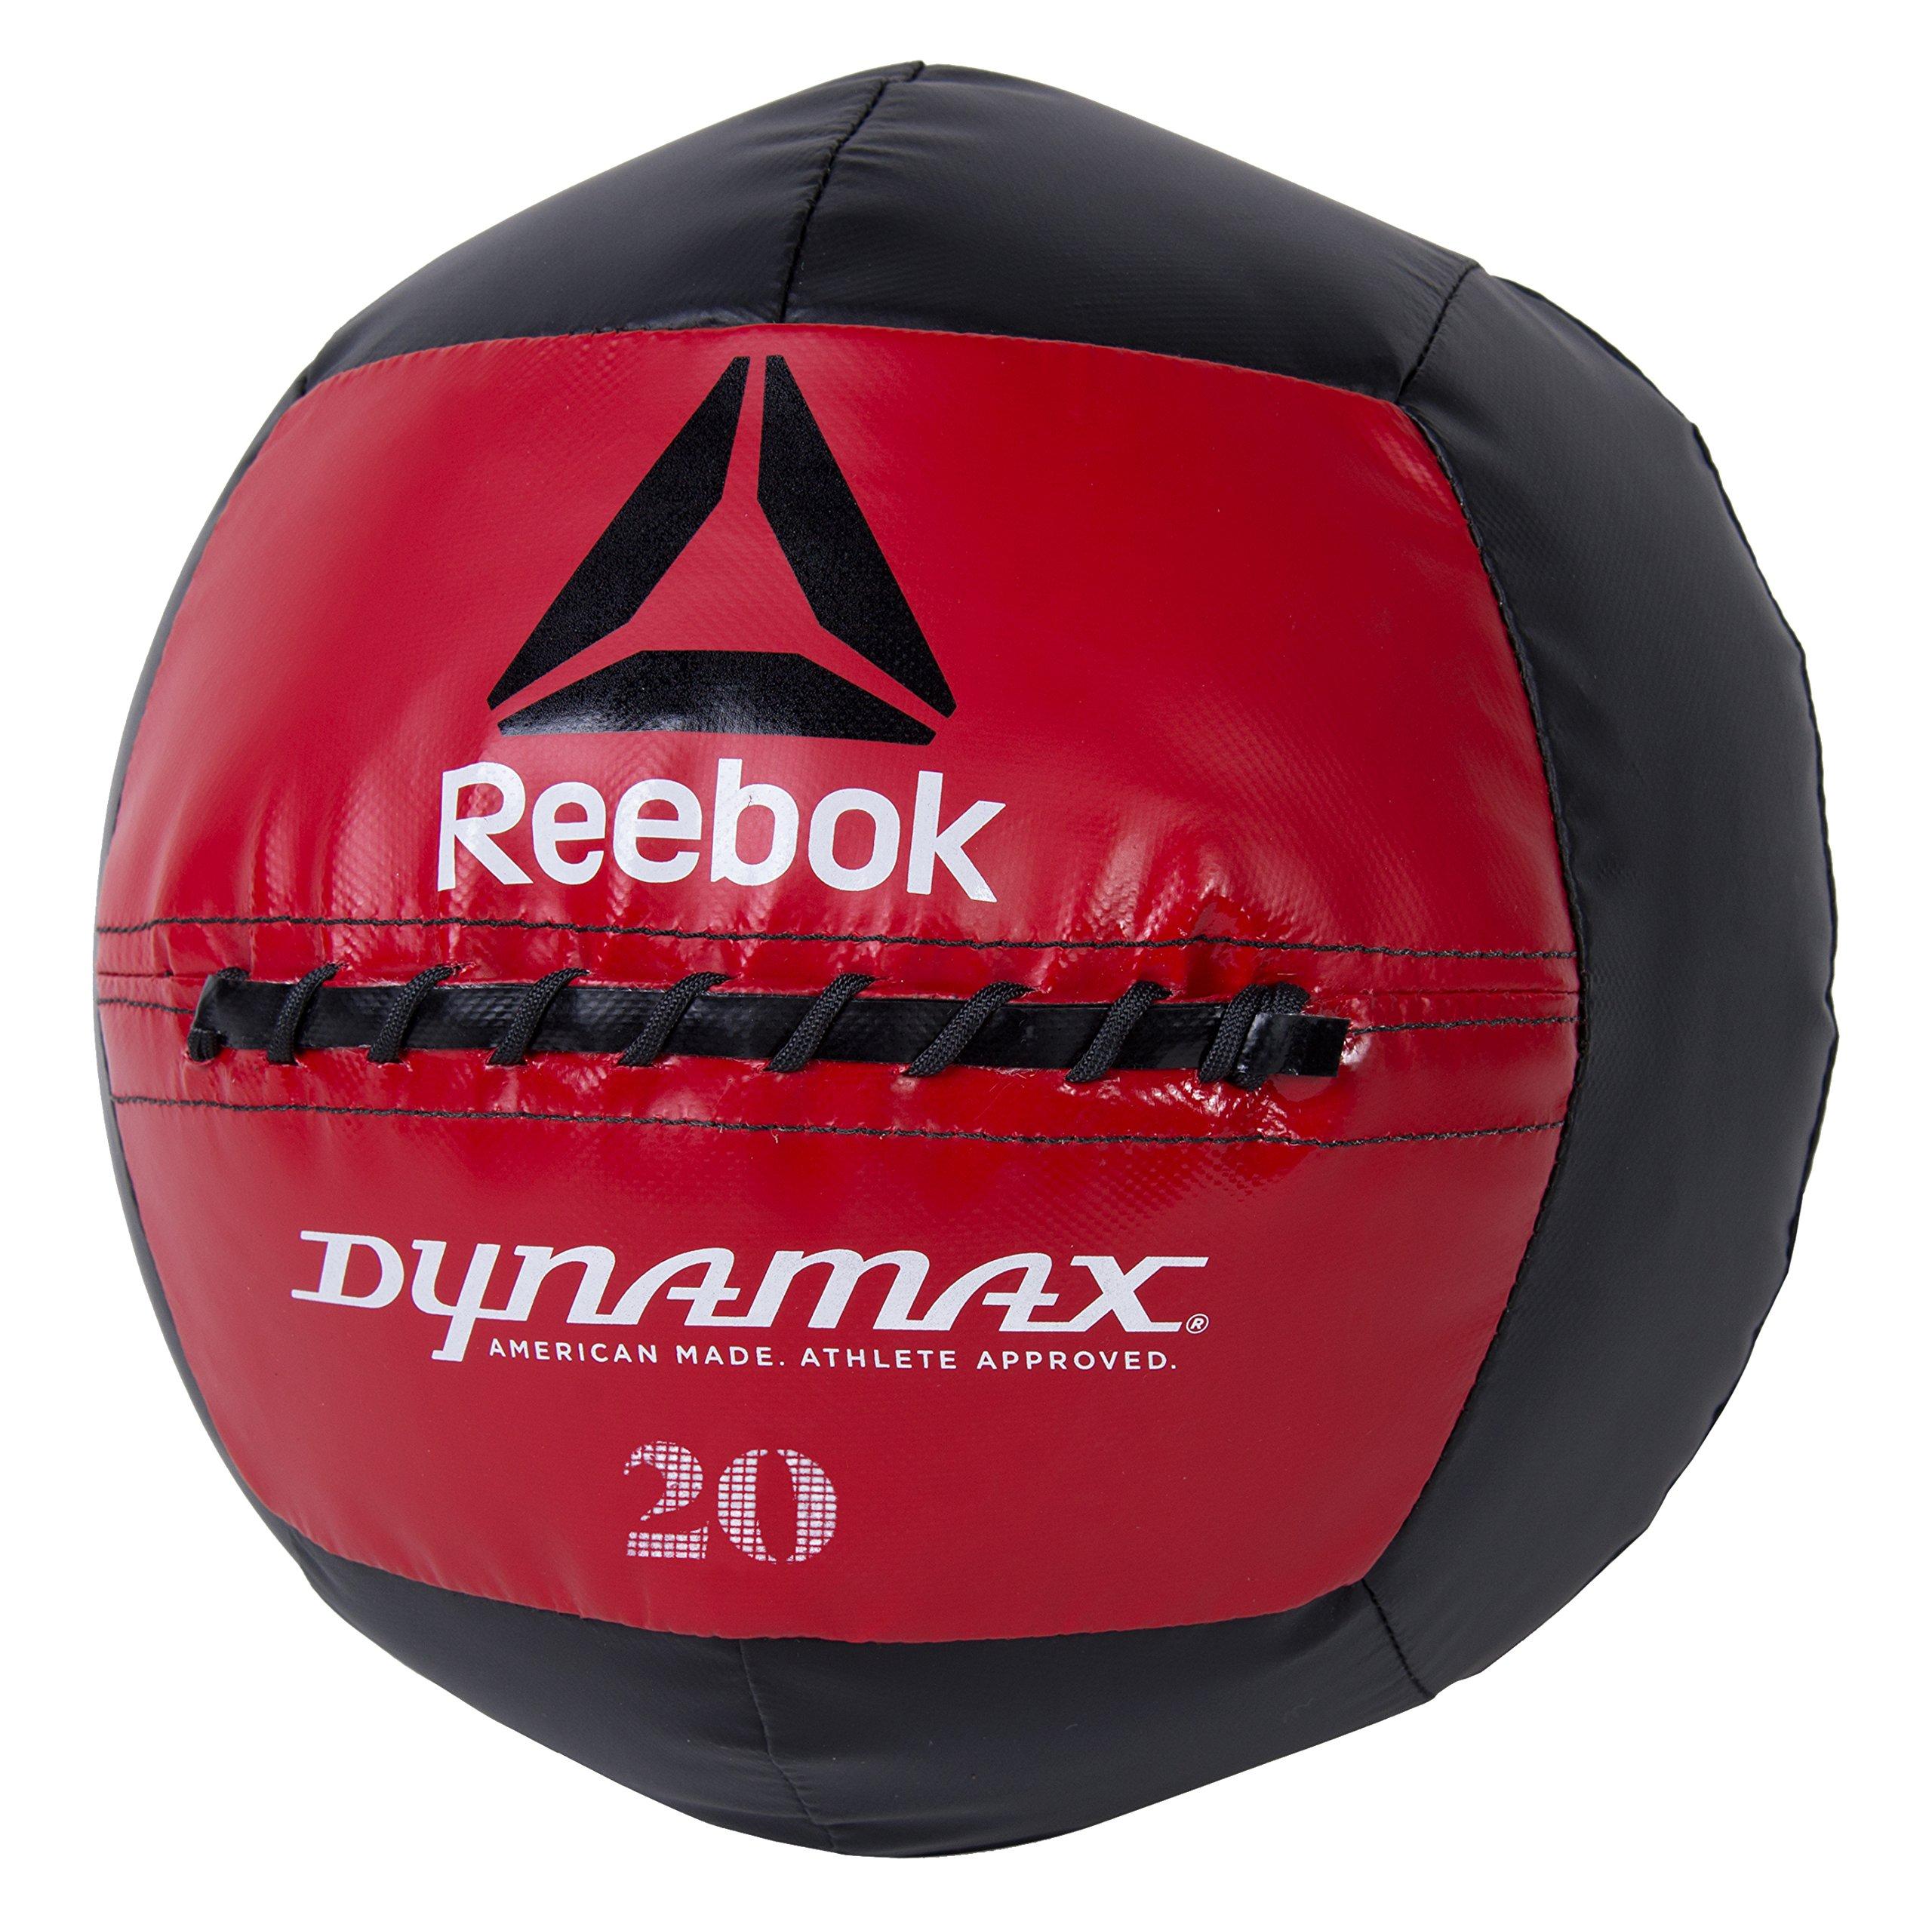 Reebok Soft-Shell Medicine Ball by Dynamax, 20 lbs